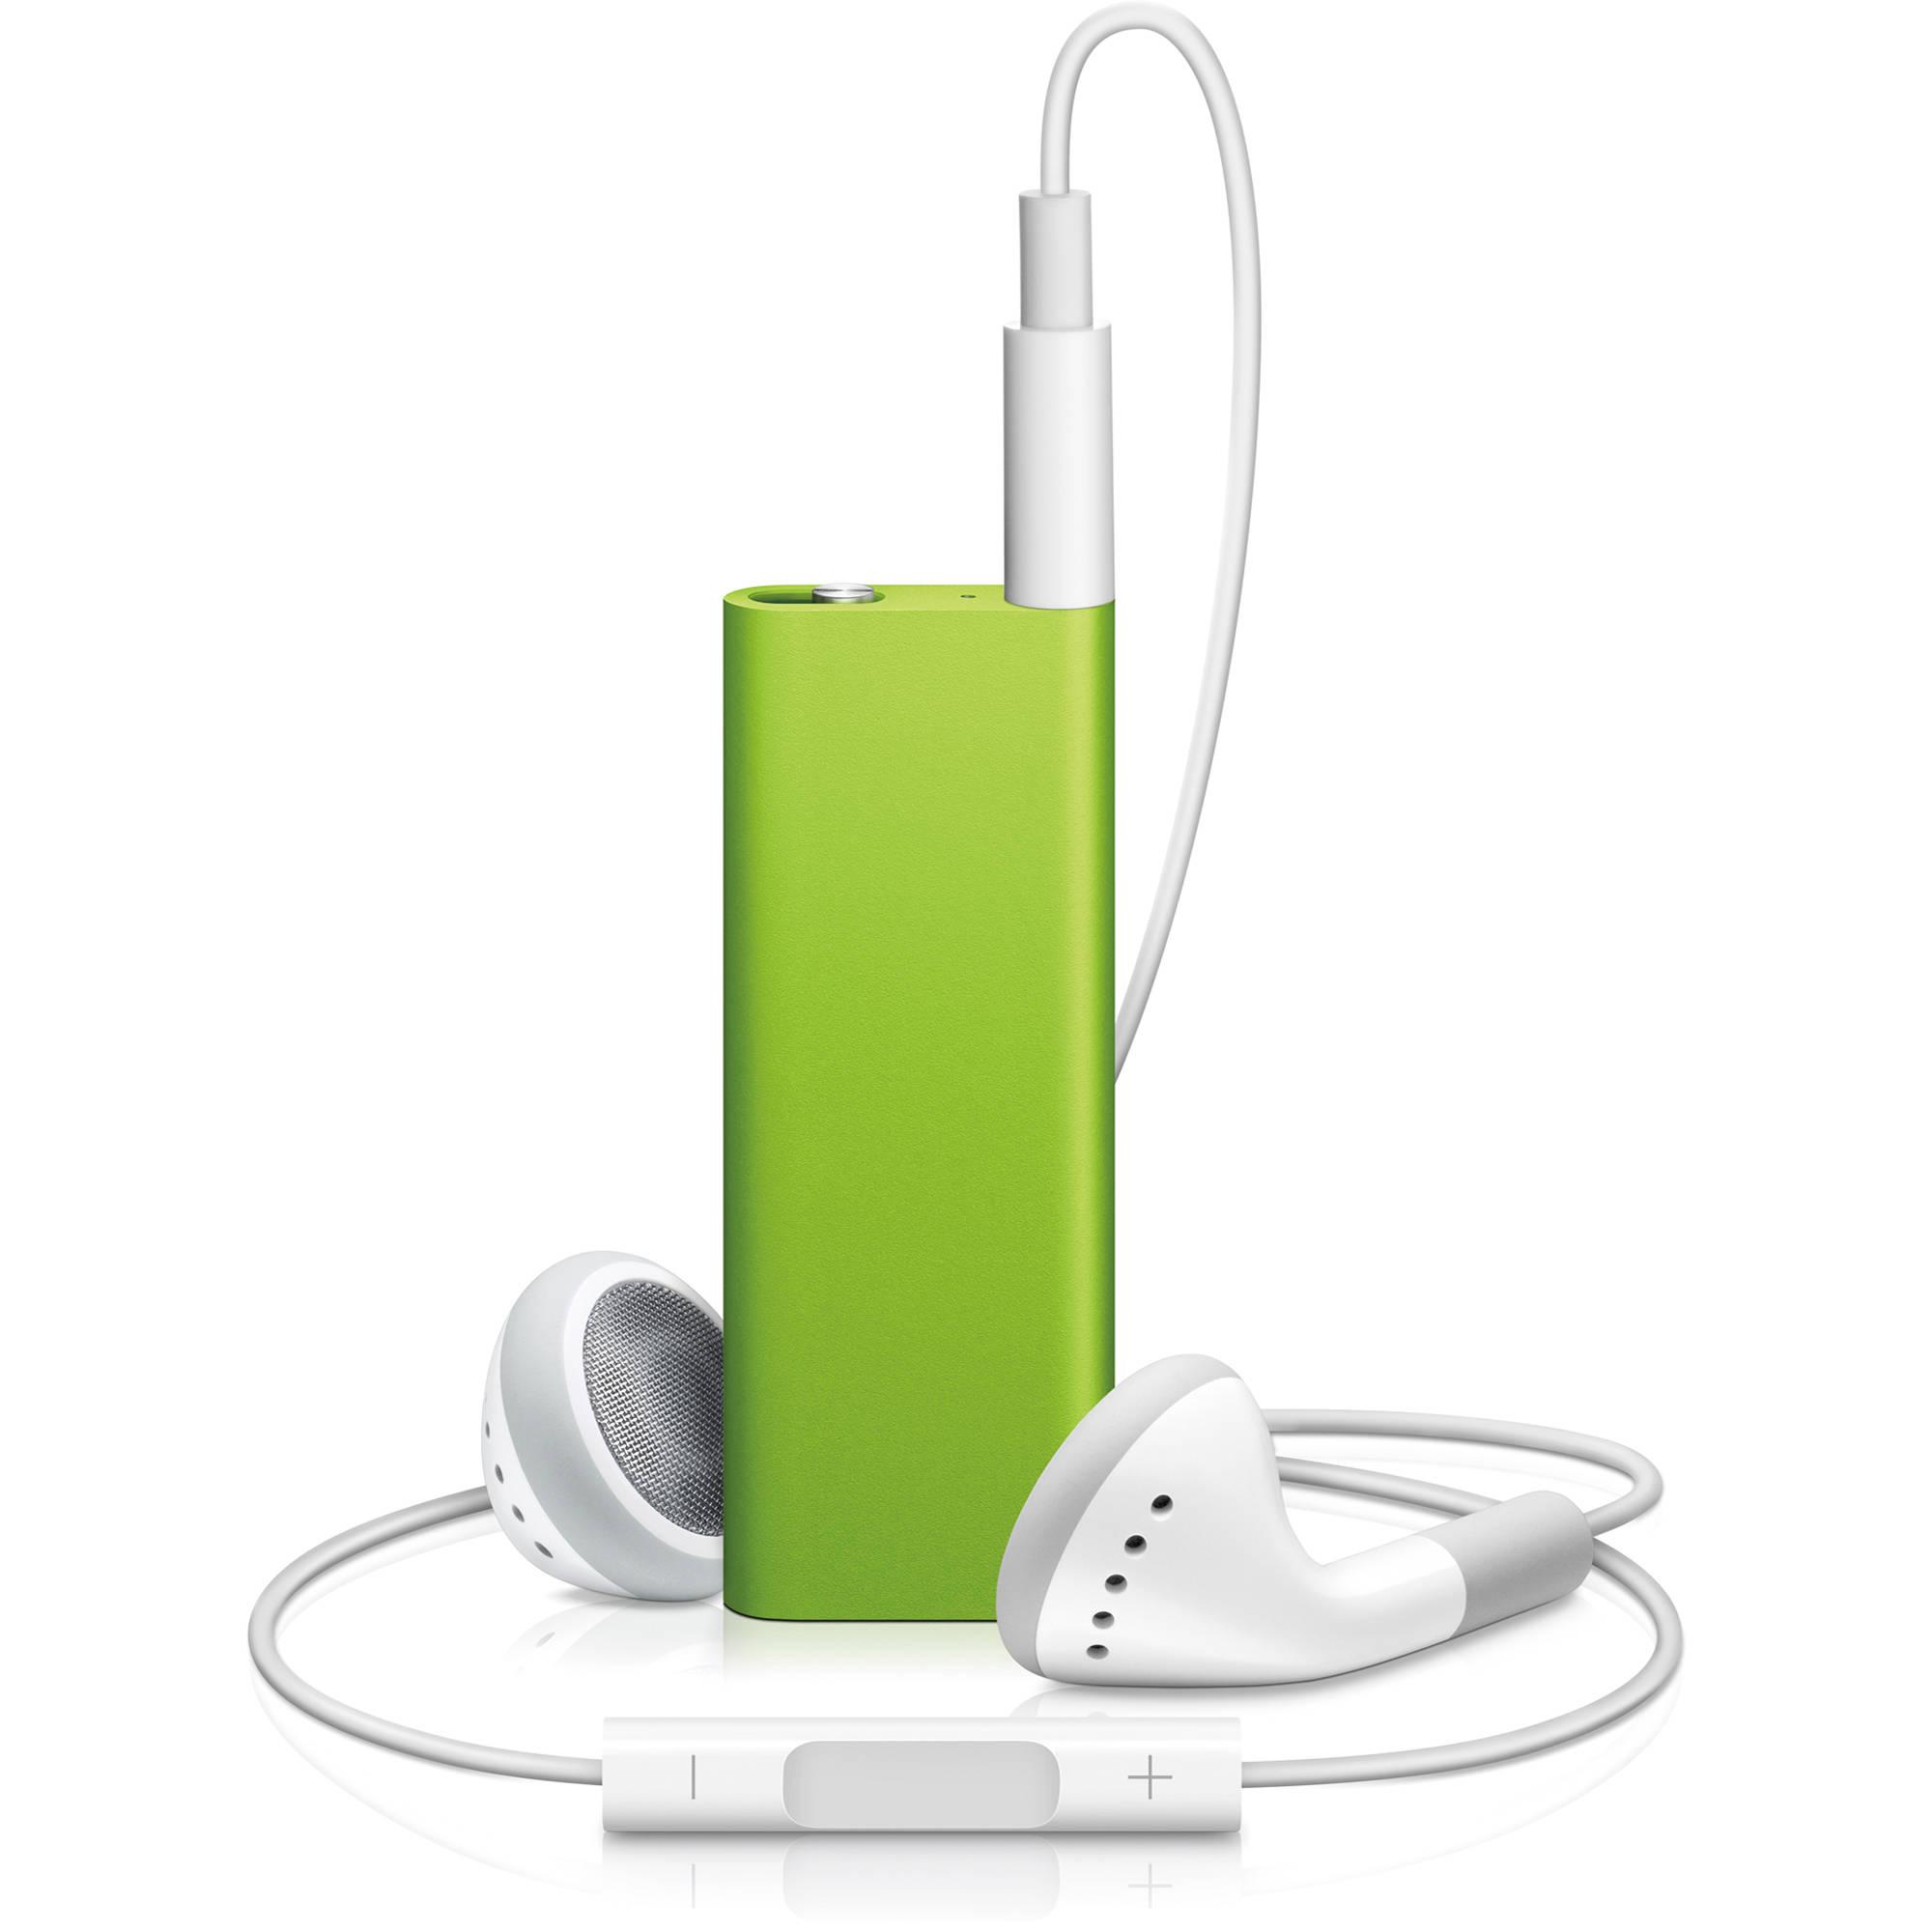 Apple 4GB iPod shuffle (Green) MC307LL/A B&H Photo Video